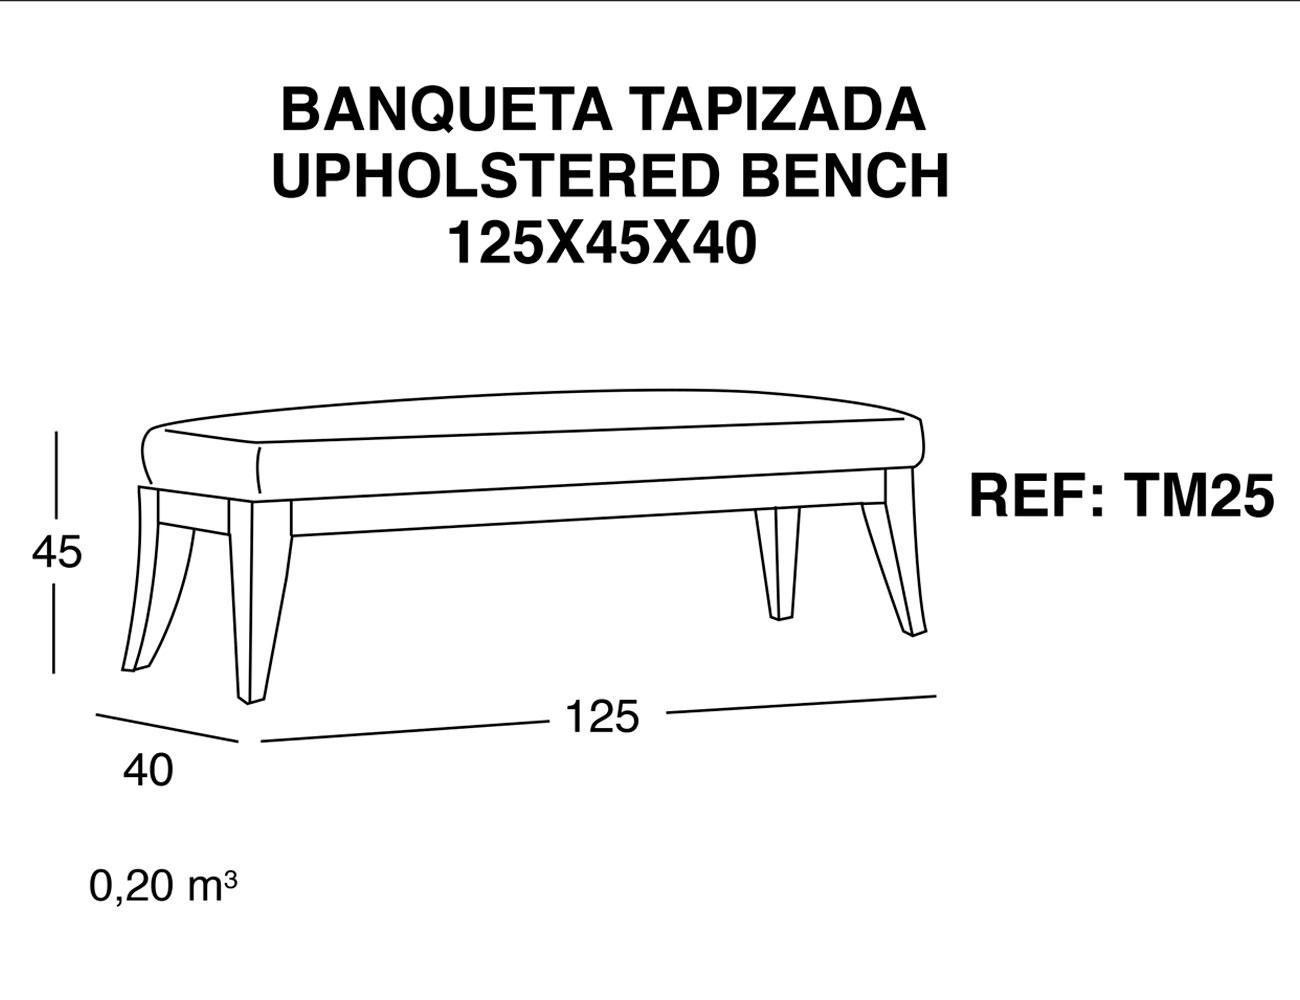 Banqueta tapizada 125 45 40